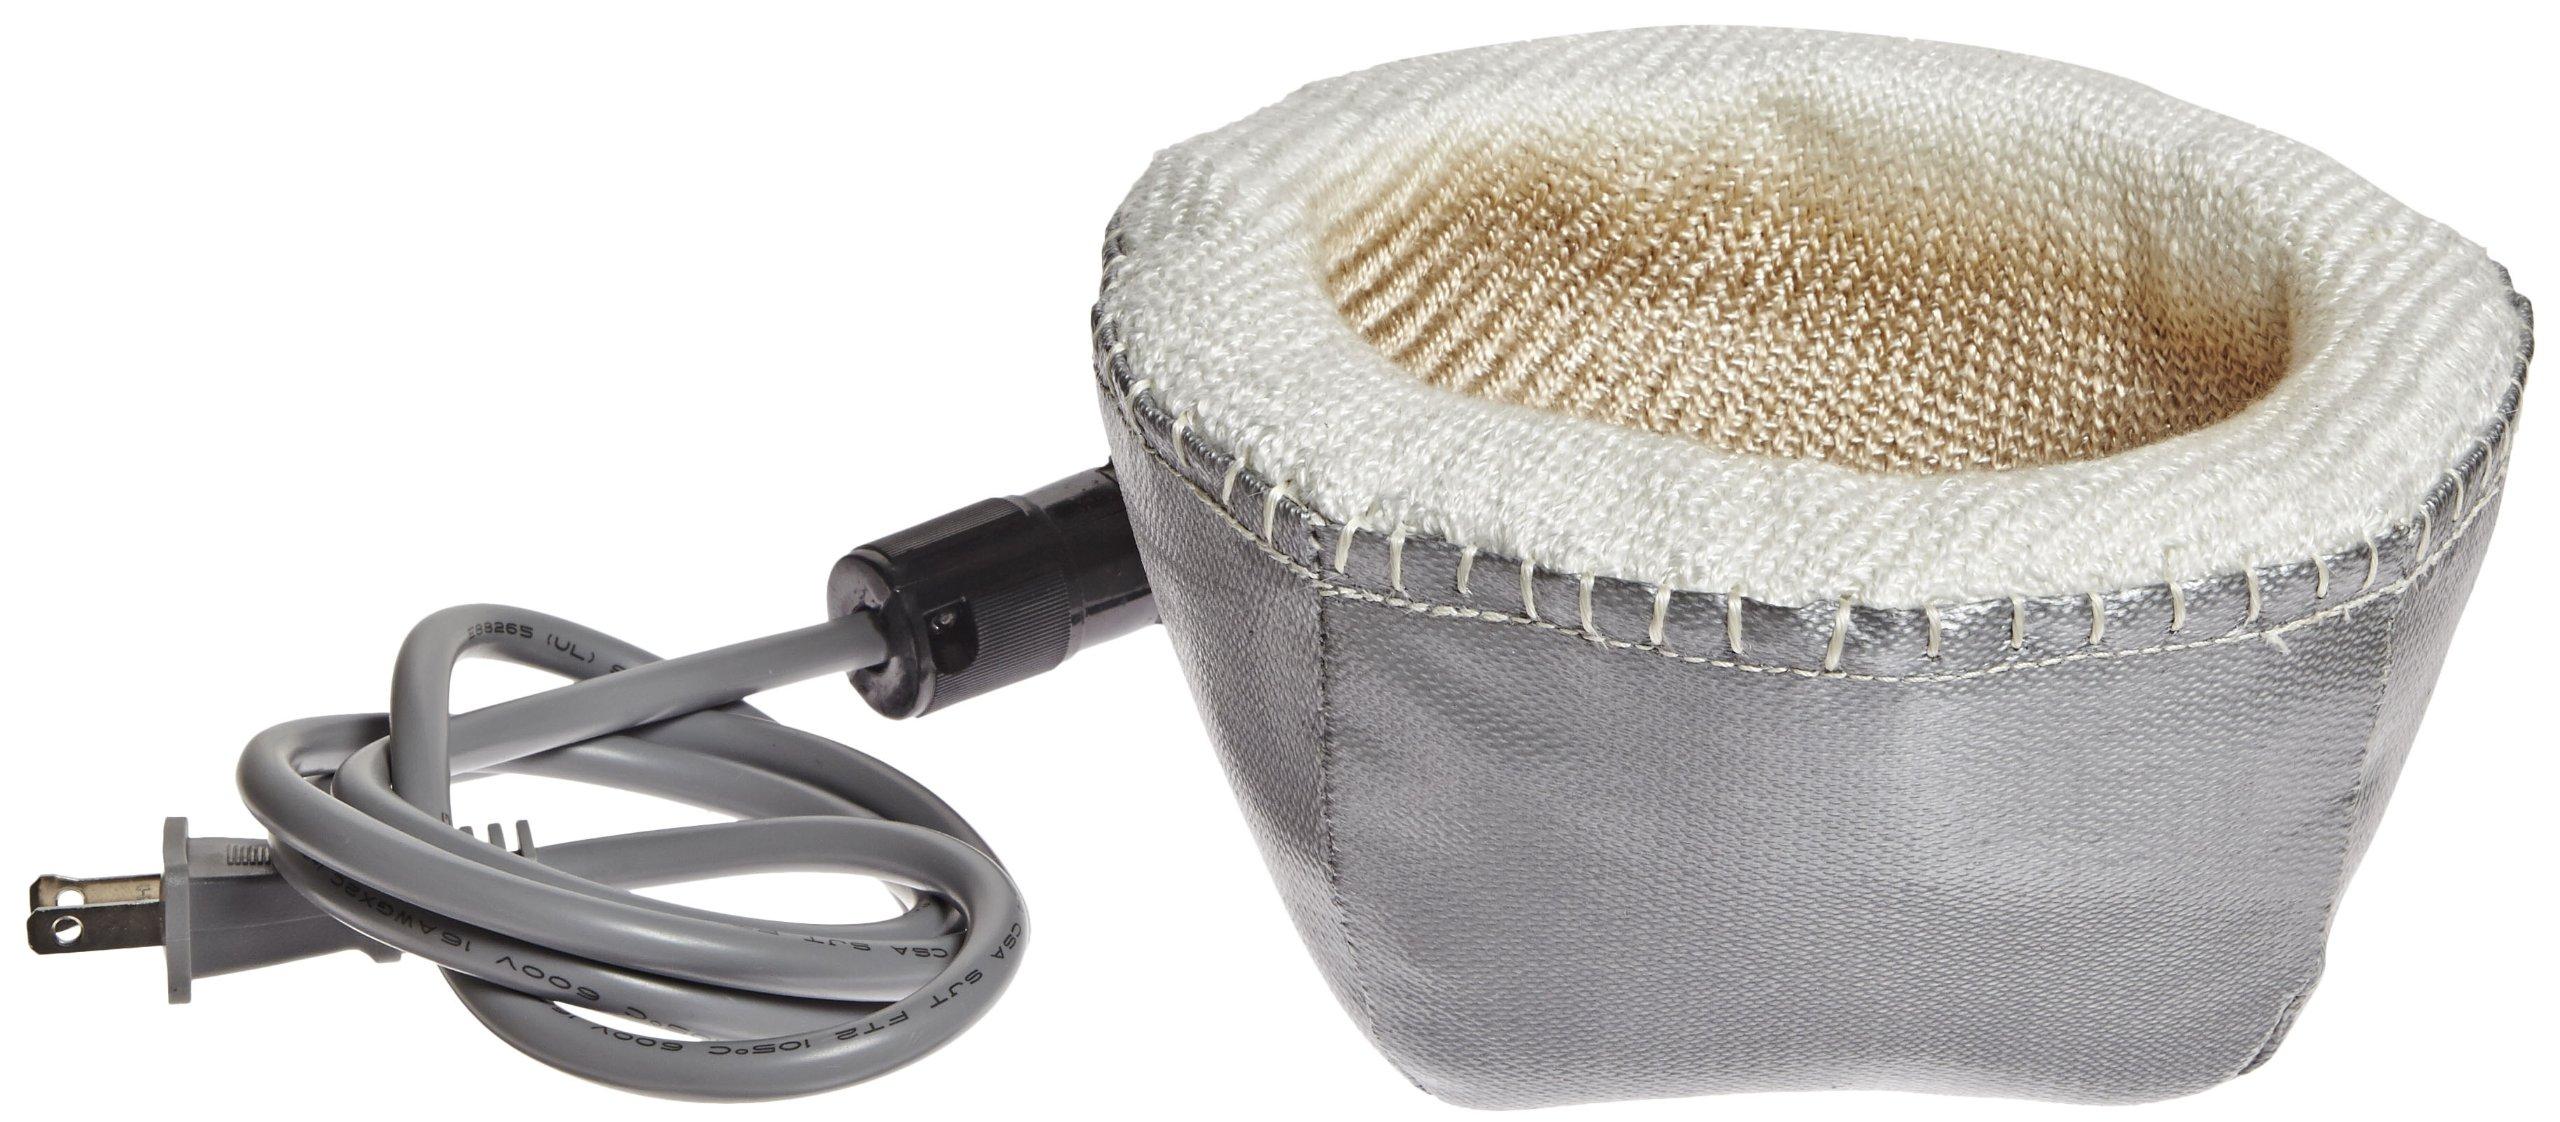 Glas-Col 100A O408 Series O Fabric Hemispherical Mantle, 1000ml Flask Capacity, 115V